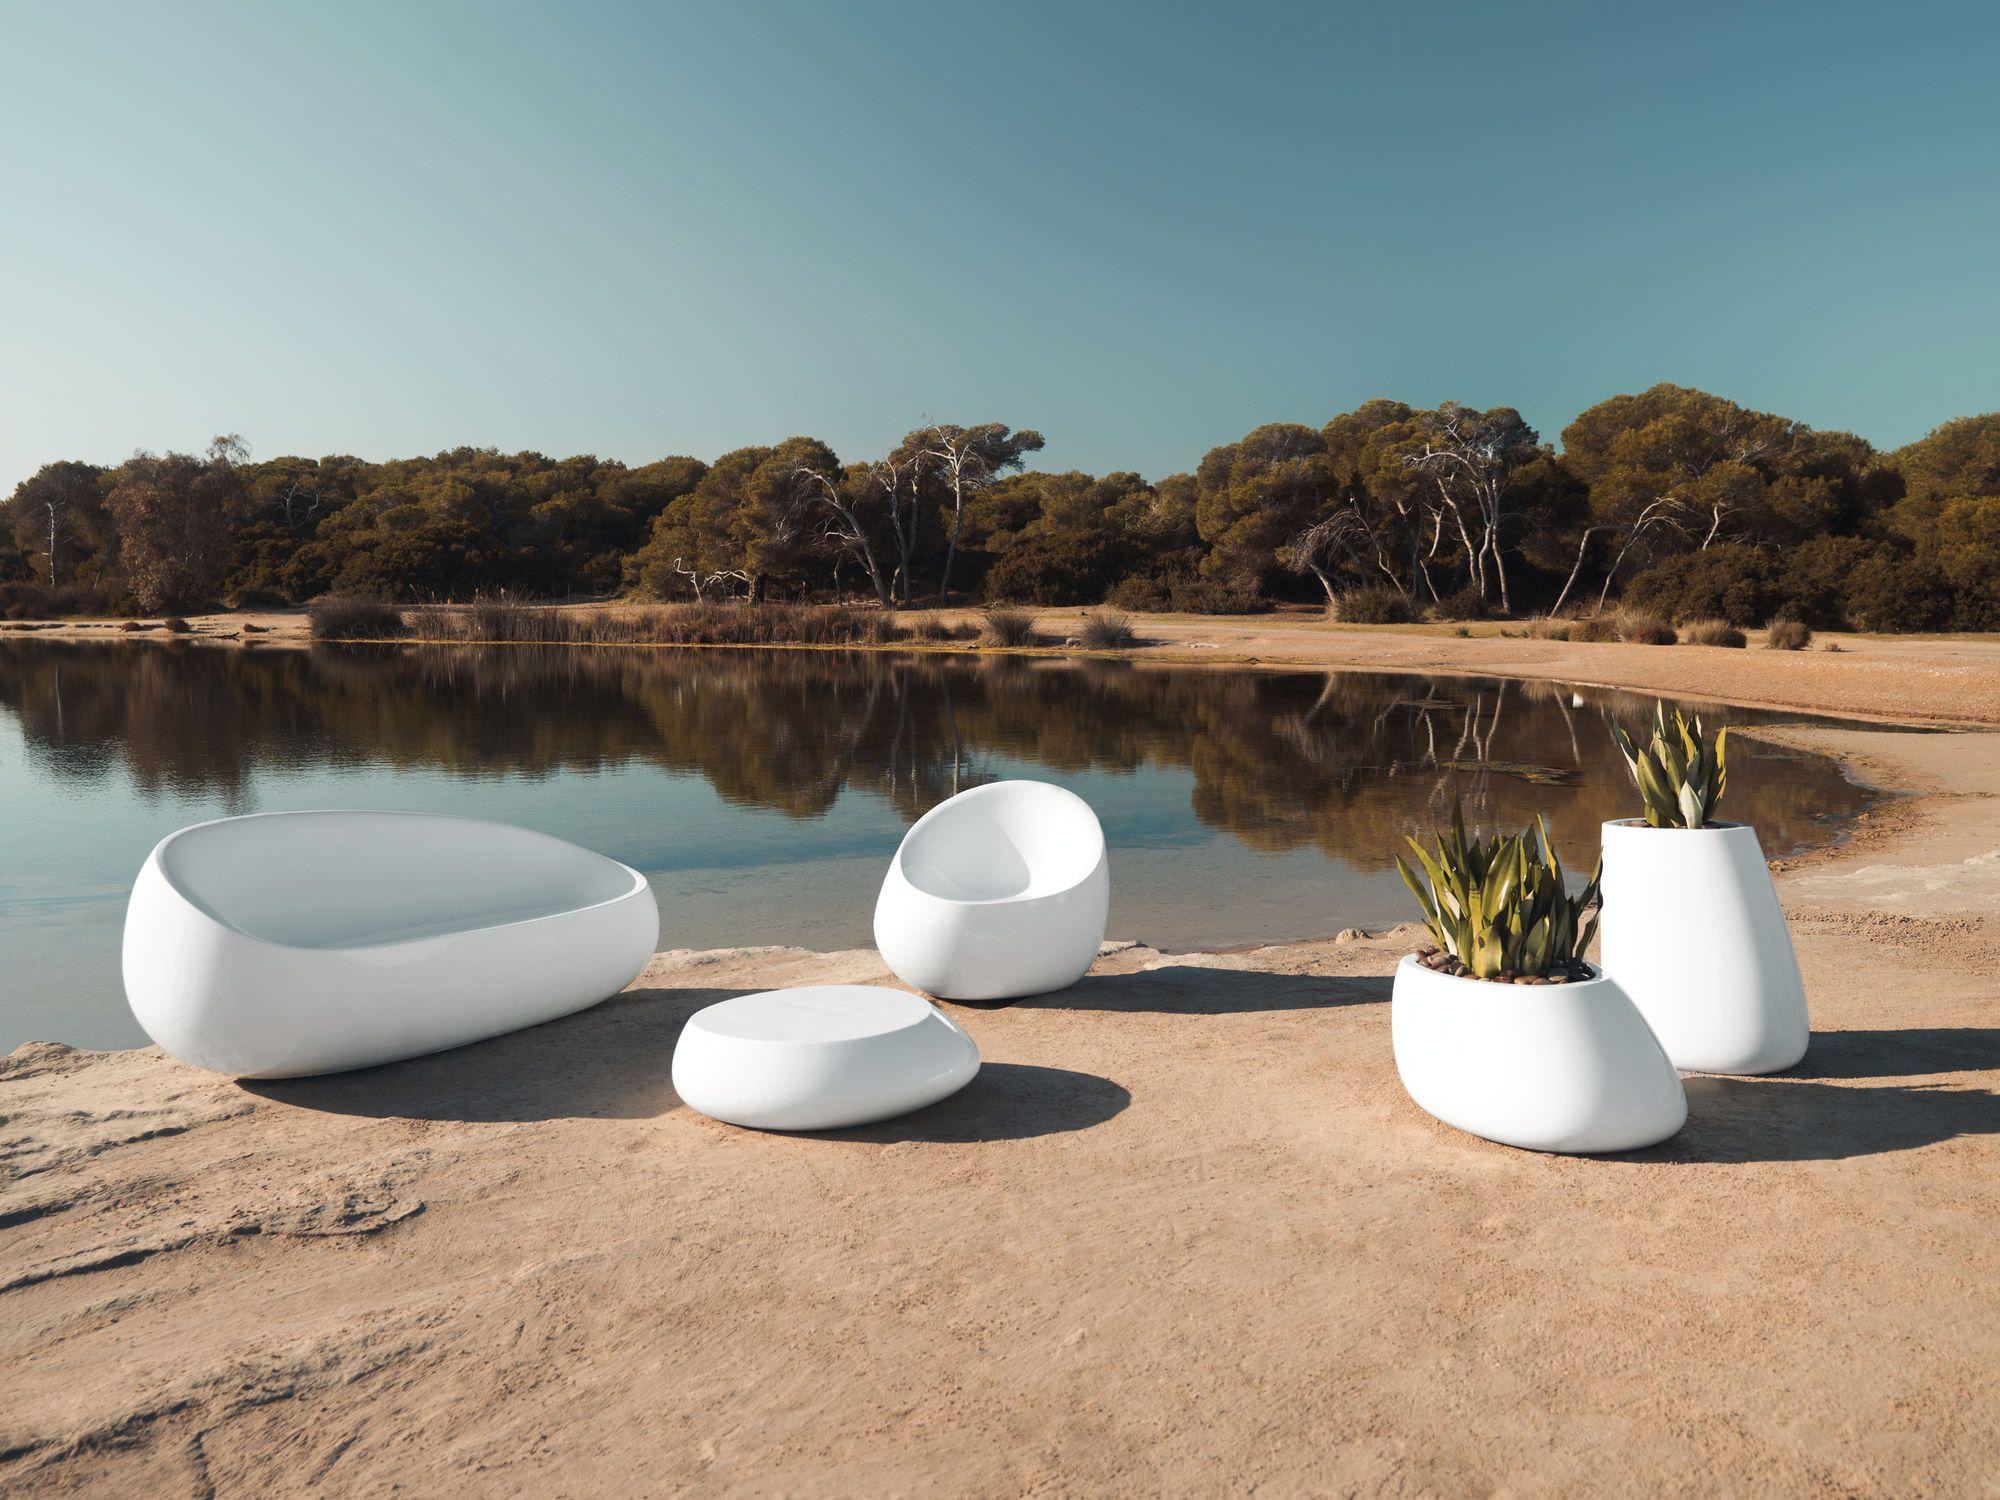 Pot jardinière blanc stone vondom design outdoor mobilierdejardin jardin exterieur terrasse